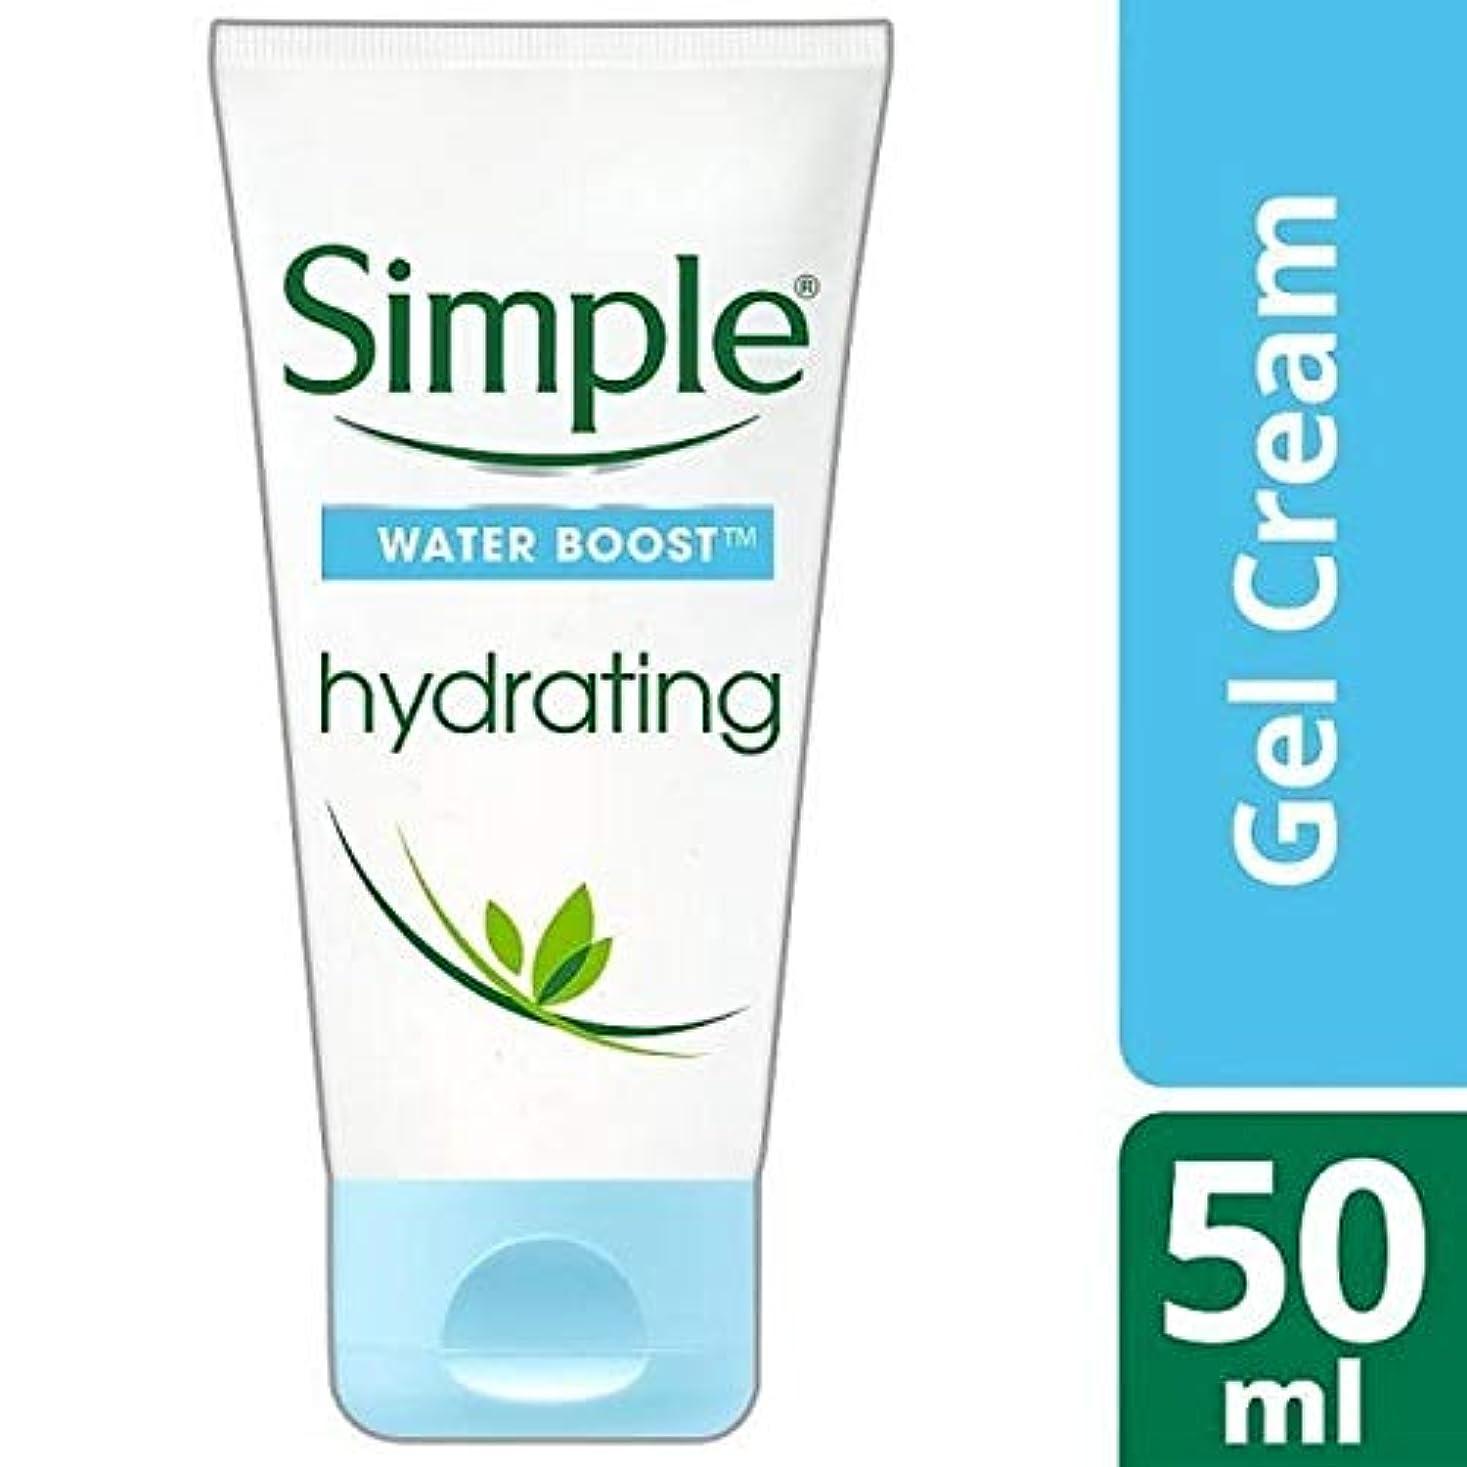 [Simple ] シンプルな水ブースト水和ゲルフェイスクリーム50Ml - Simple Water Boost Hydrating Gel Face Cream 50ml [並行輸入品]